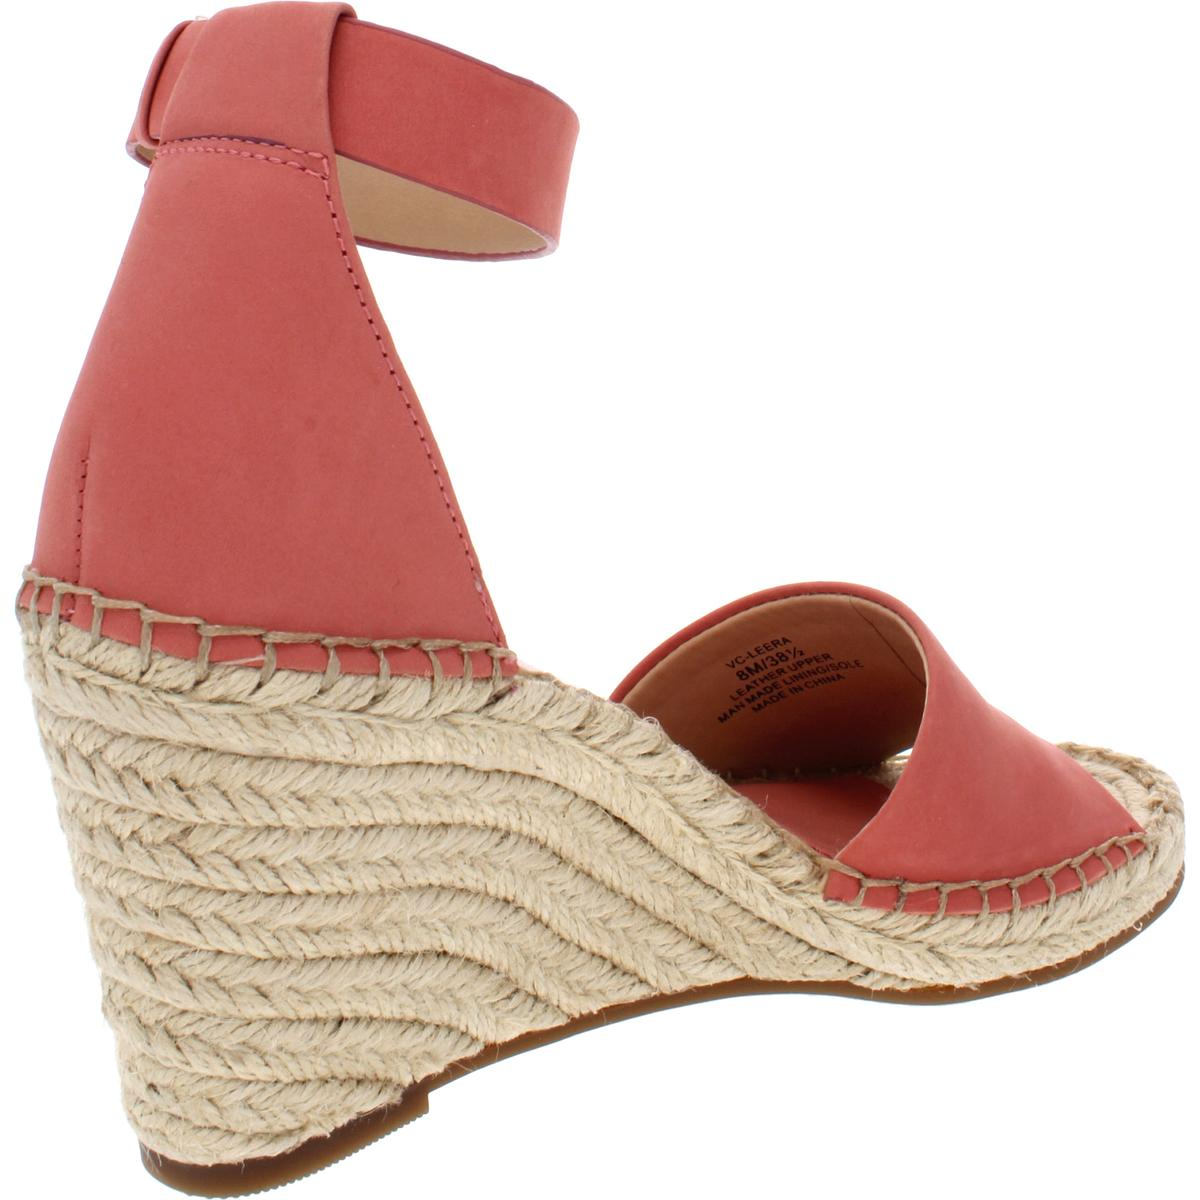 489470fd122 Vince Camuto Womens Wedge HEELS Fancy Flamingo Nubuck Leather ...